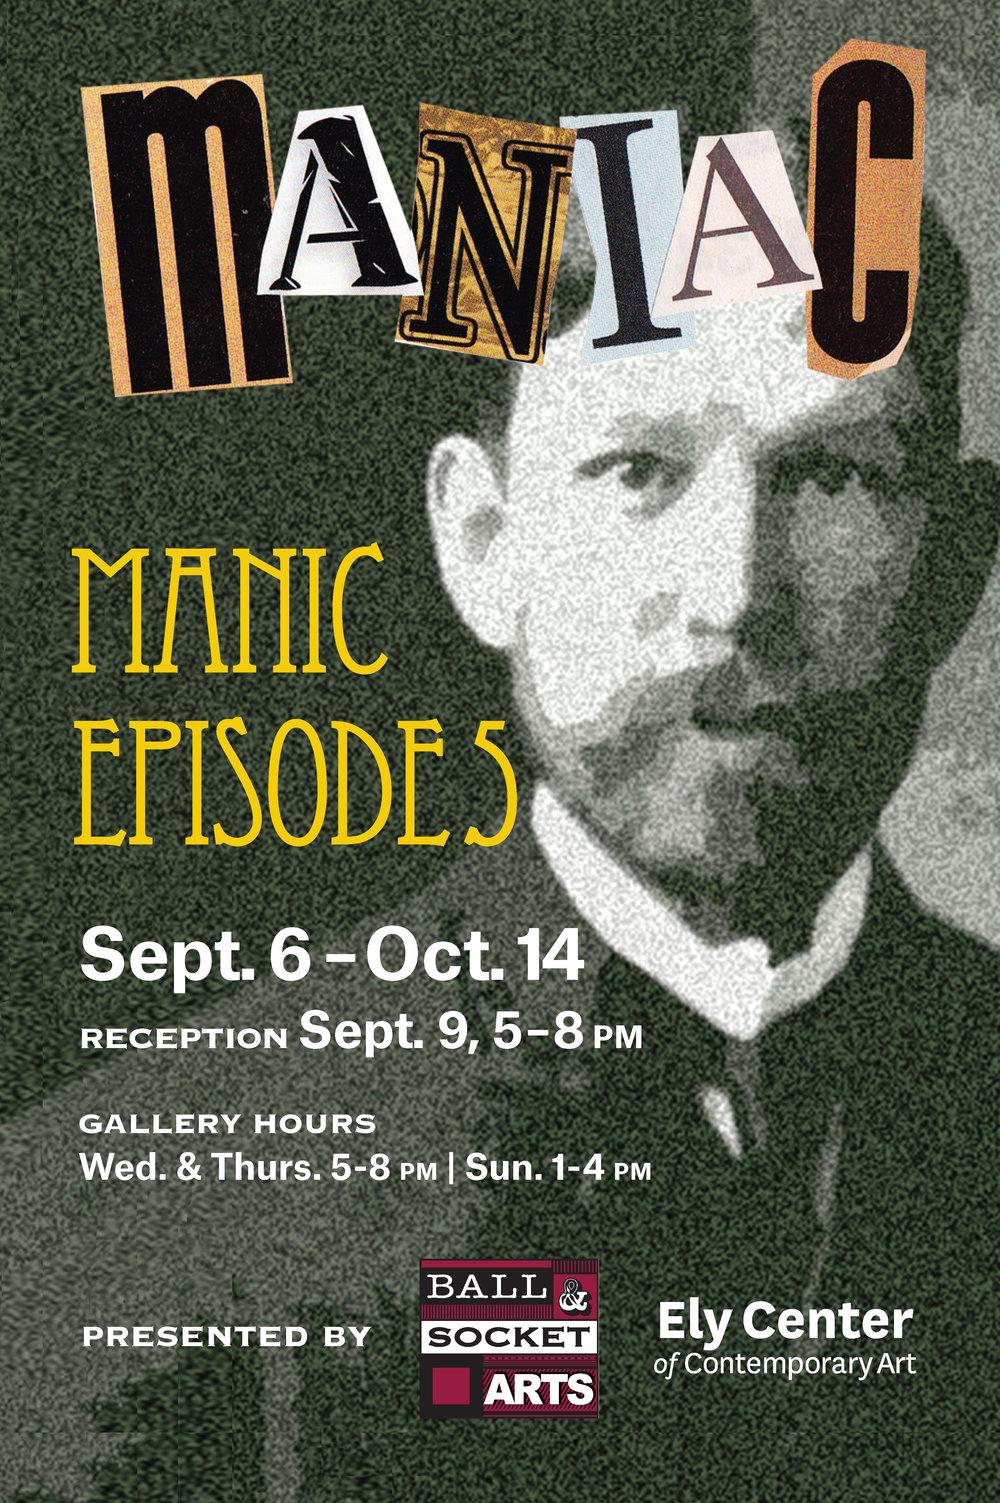 Maniac: Manic Episode 5